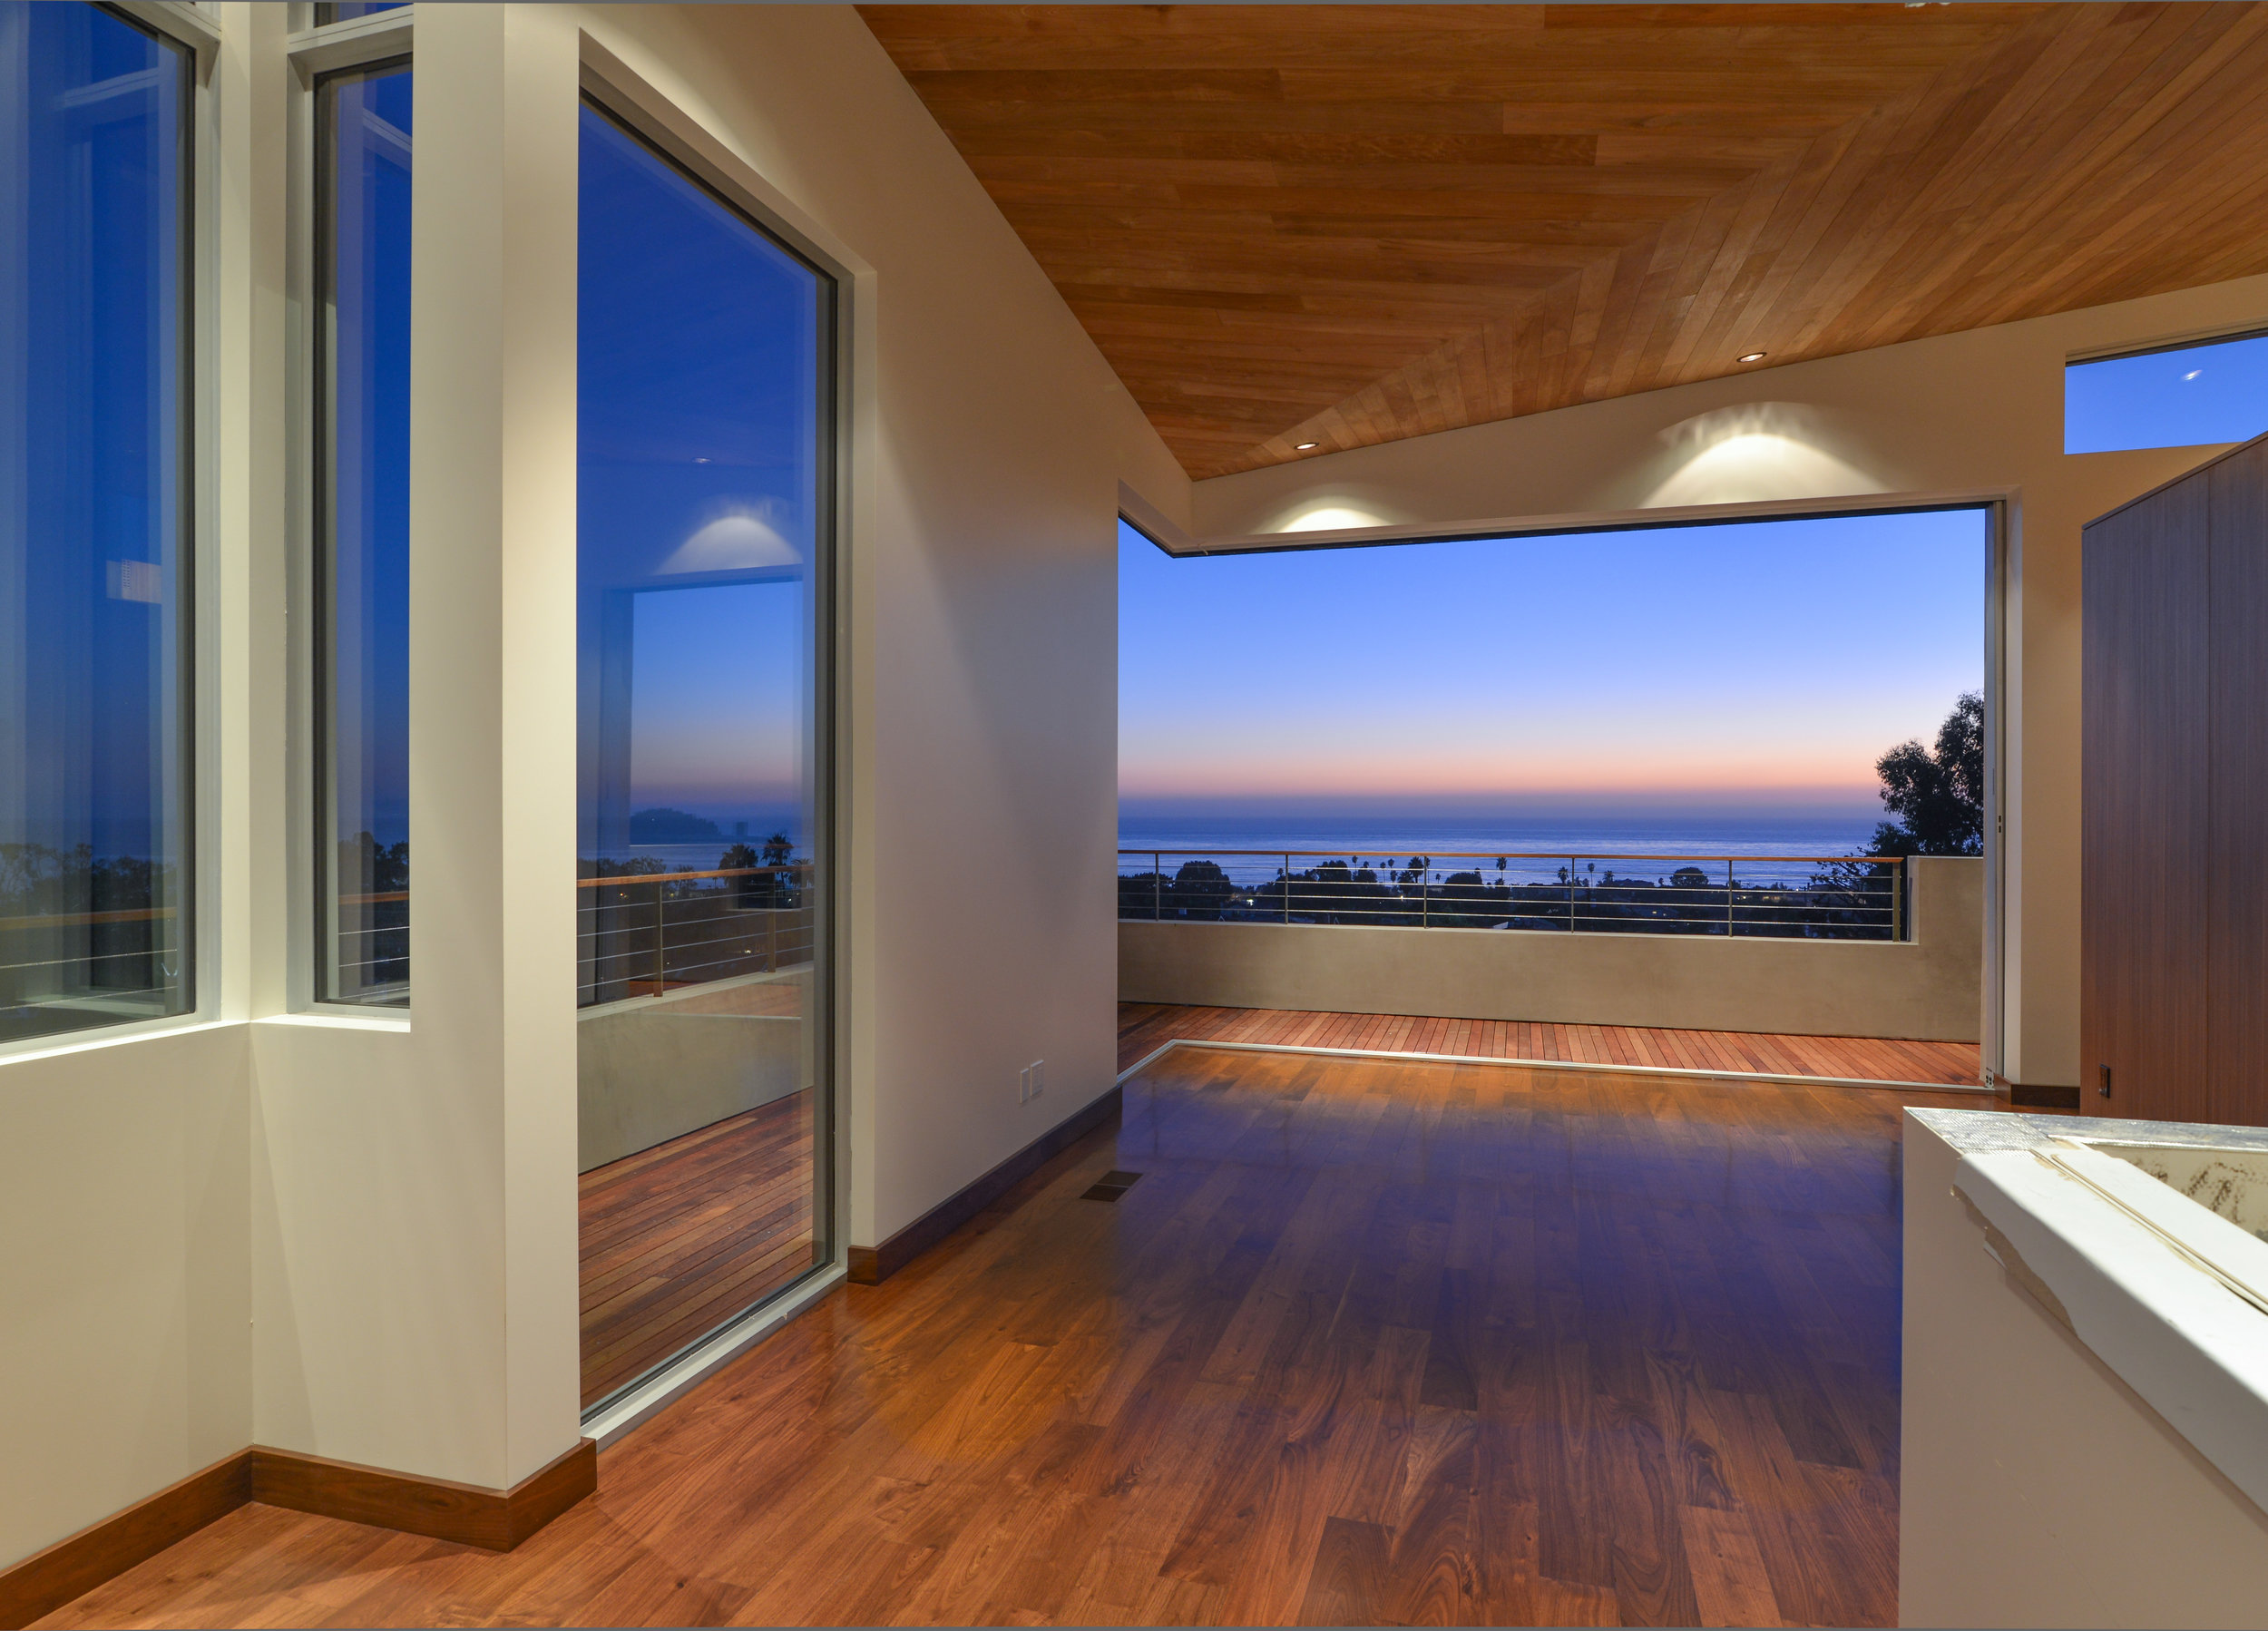 S.E.A.-Studio-Environmental-Architecture-David-Hertz-FAIA-Linda-Rosa-House-La-Jolla-San-Diego-sustainable-regenerative-restorative-design-modern-residential-mindful-garden-panoramic-ocean-view-open-concept-california-dream-4.jpg